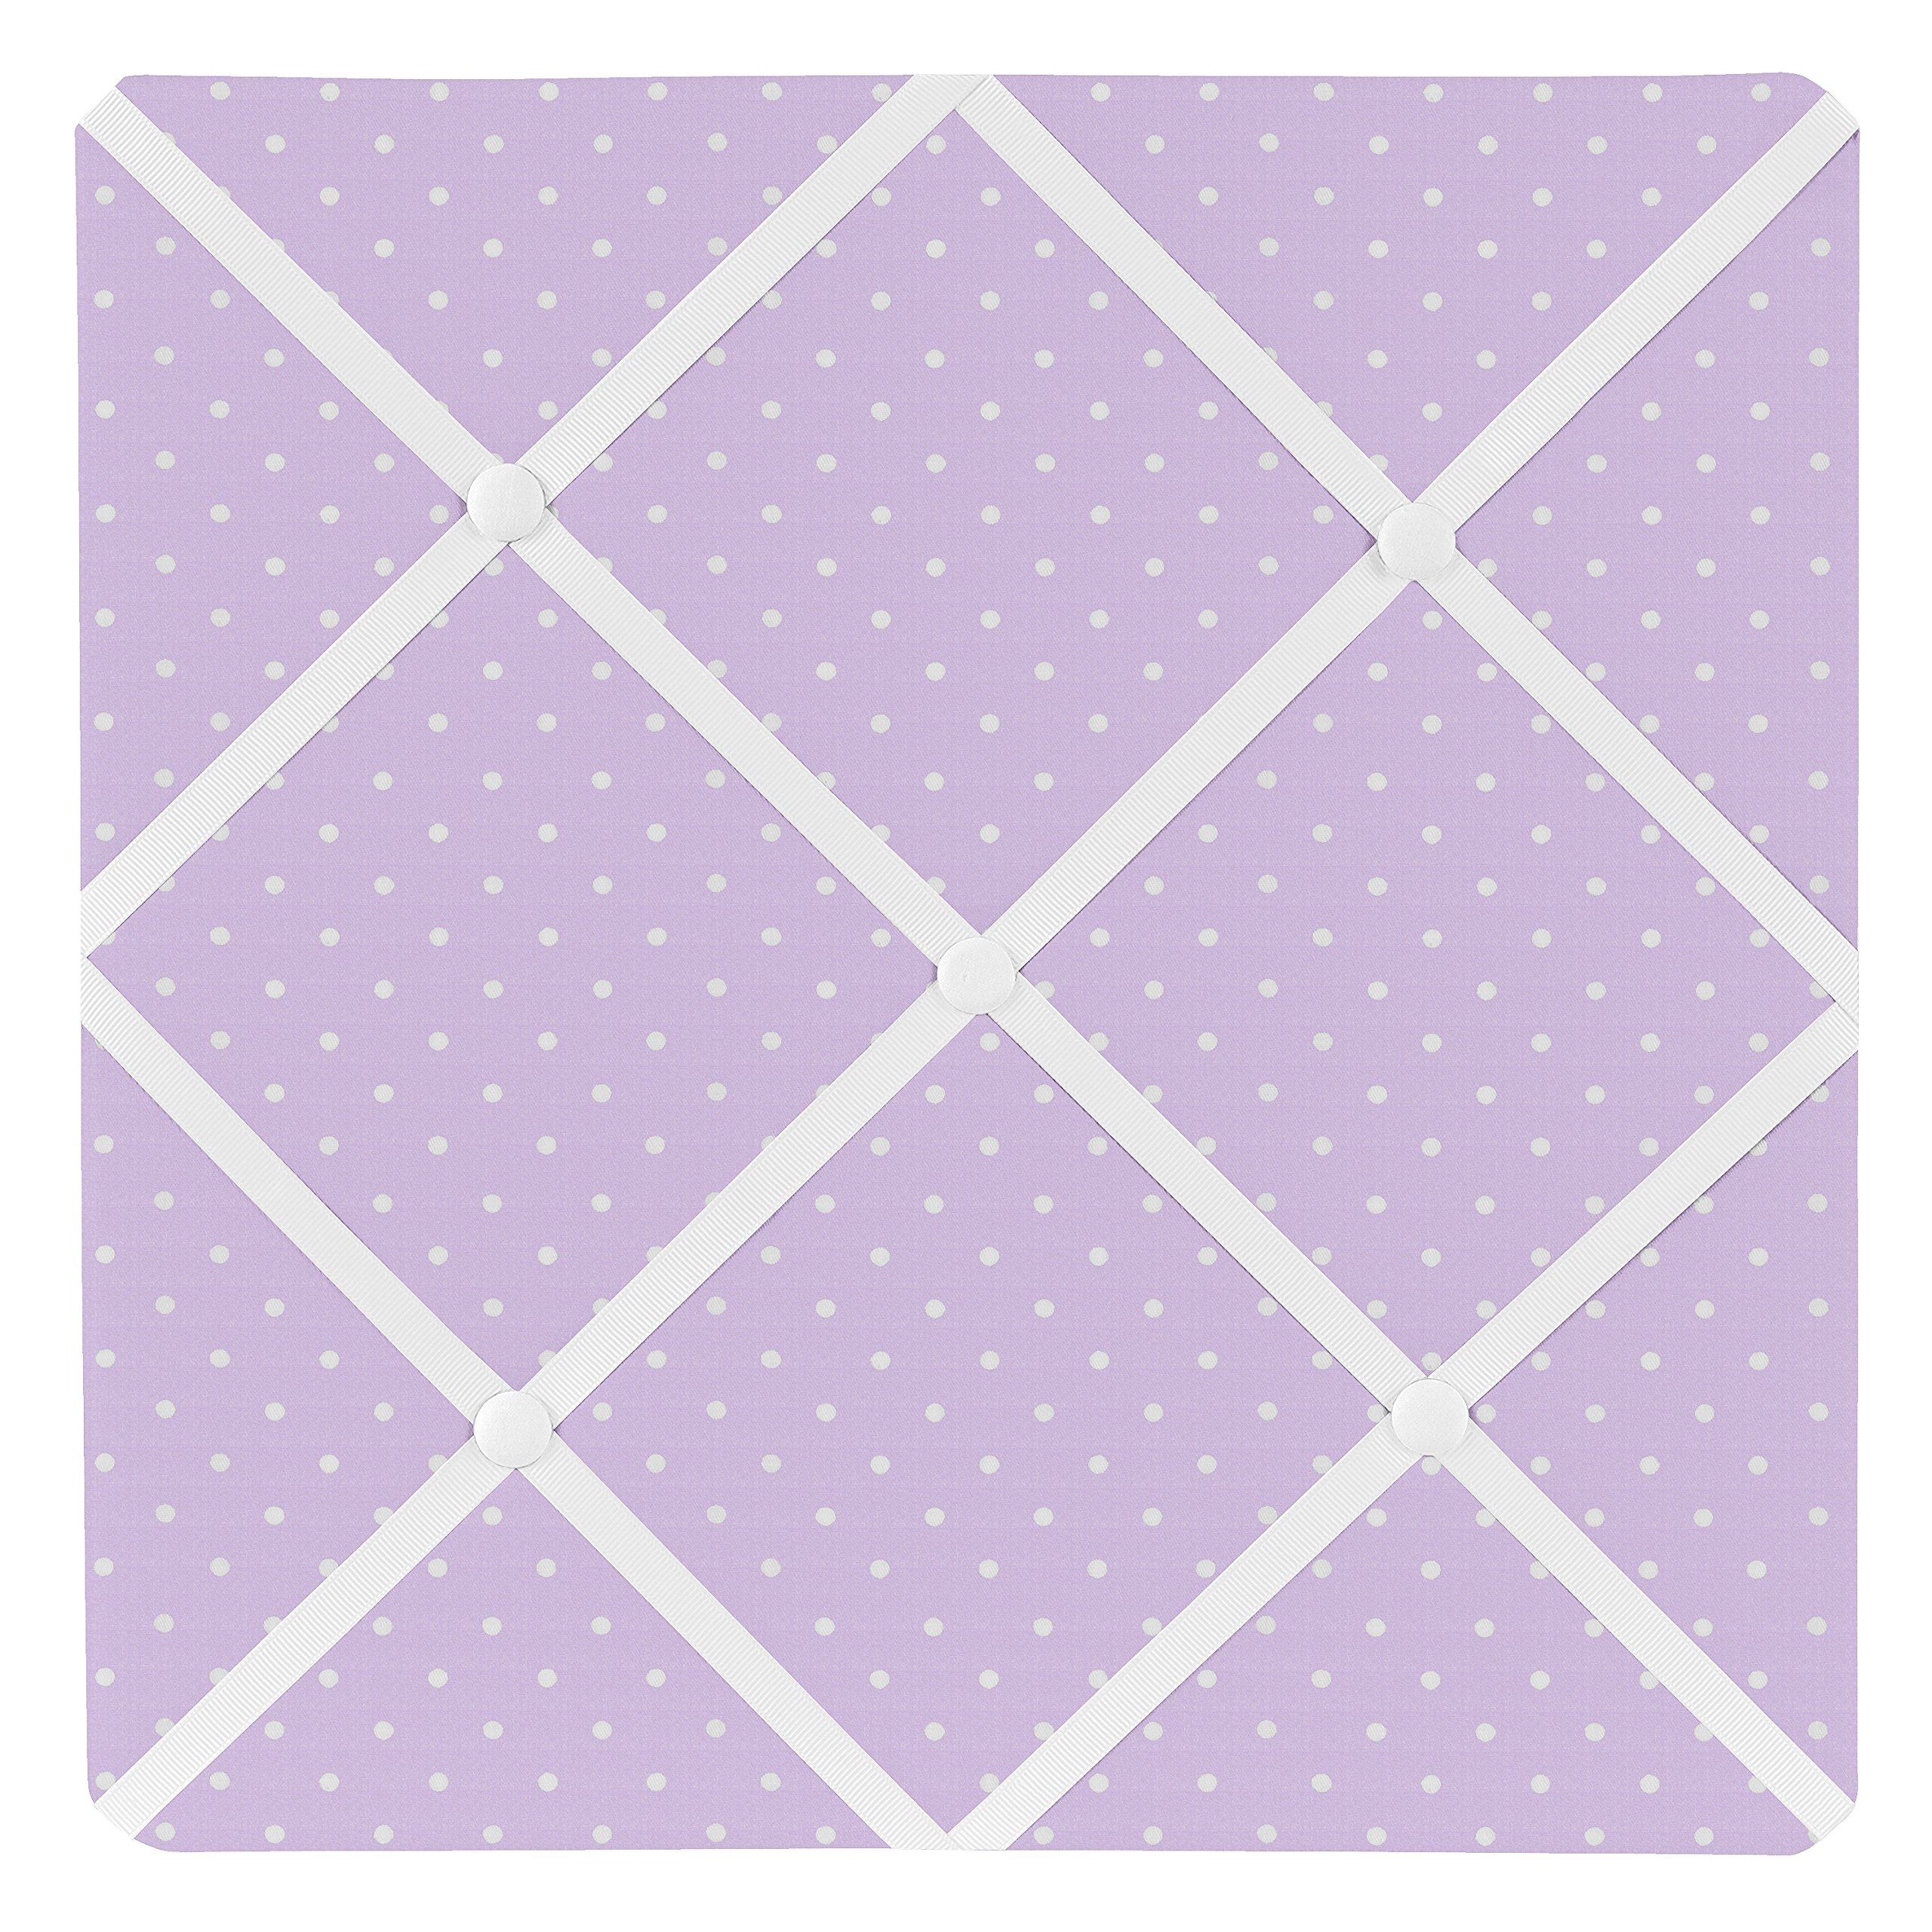 Sweet Jojo Designs Purple Polka Dot Fabric Memory/Memo Photo Bulletin Board for Mod Dots Collection by Sweet Jojo Designs